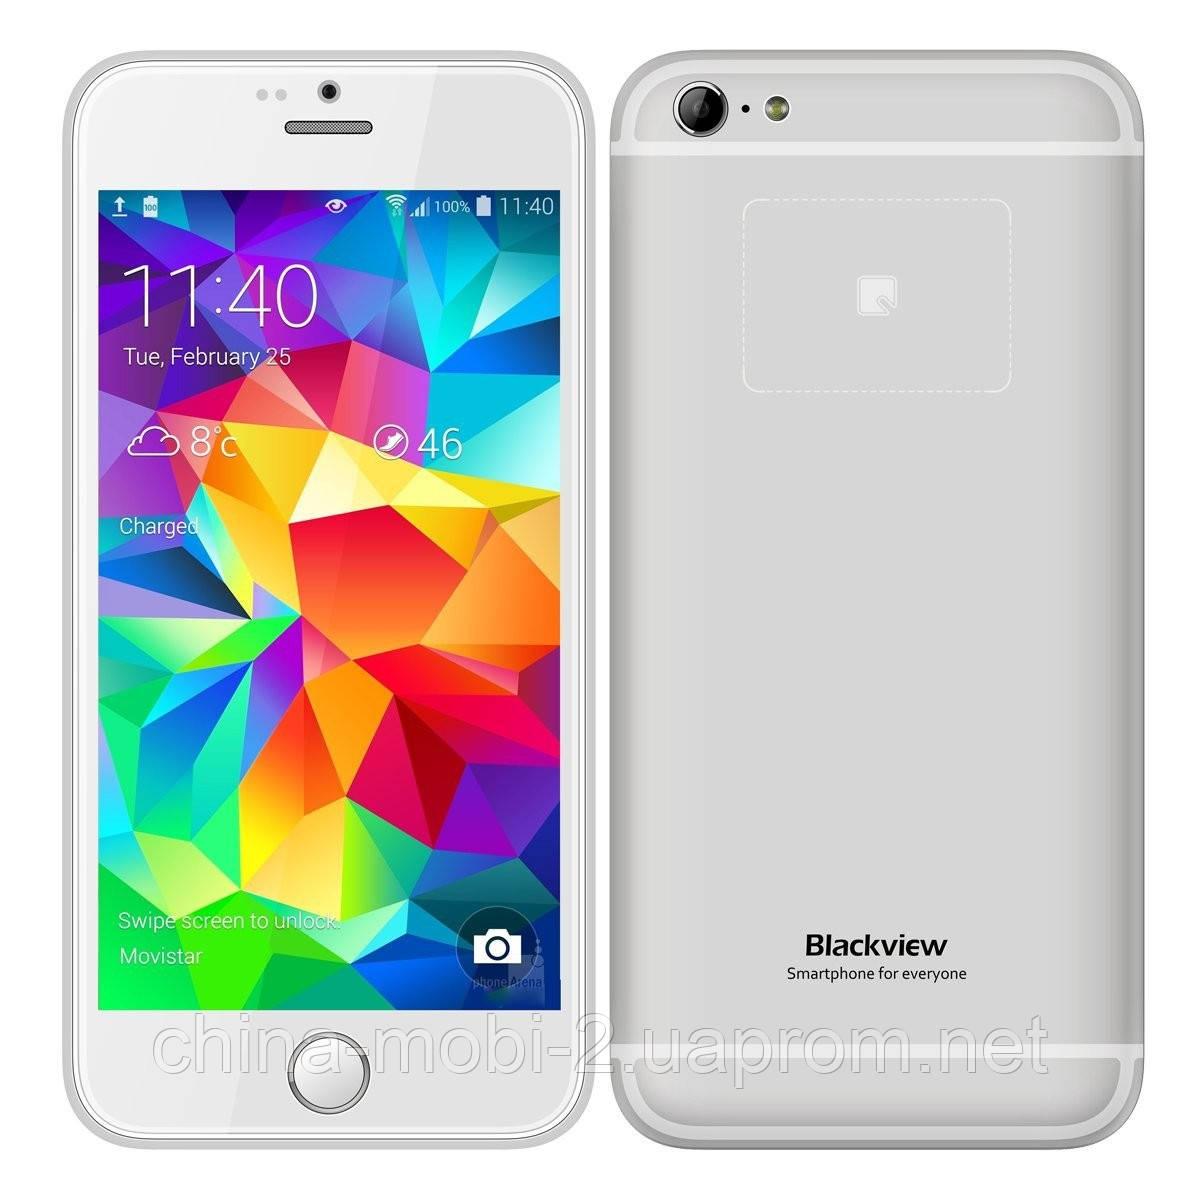 Смартфон Blackview Ultra A6 Silver